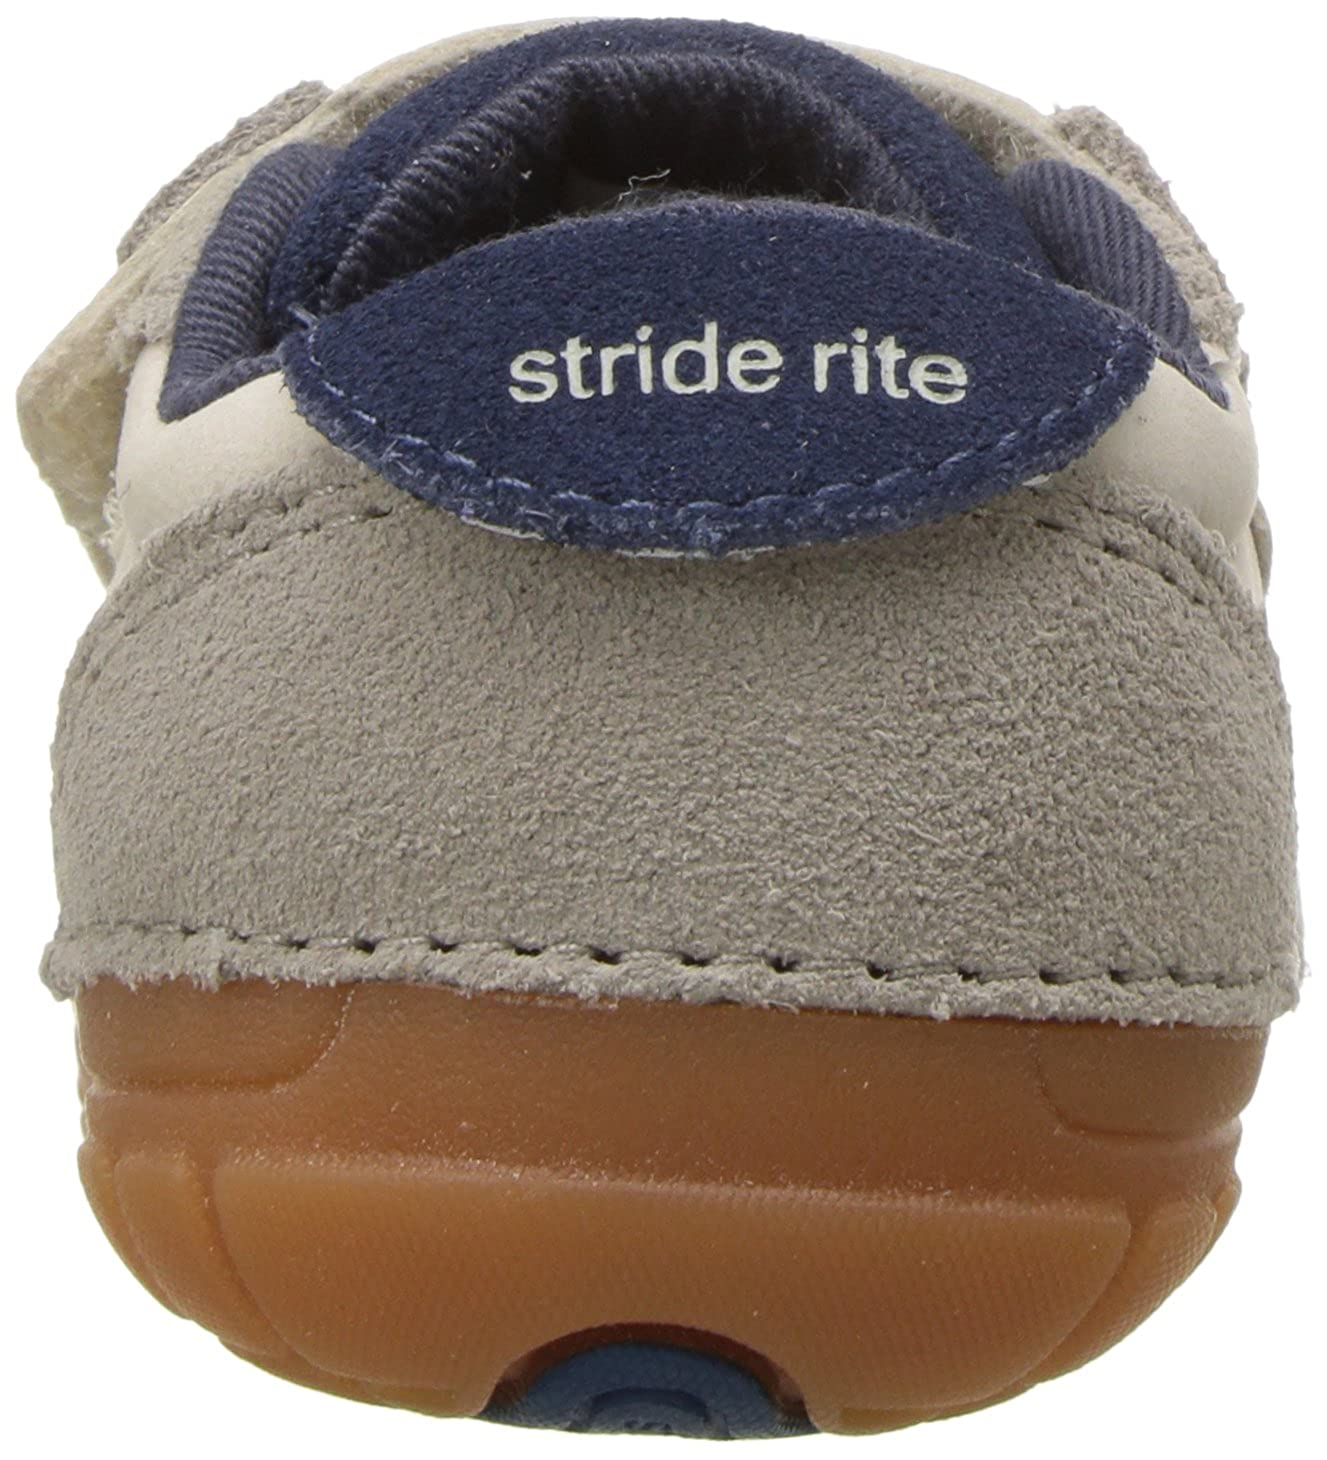 Stride Rite Kids Soft Motion Wyatt Sneaker Stride Rite Kids/' Soft Motion Wyatt Sneaker